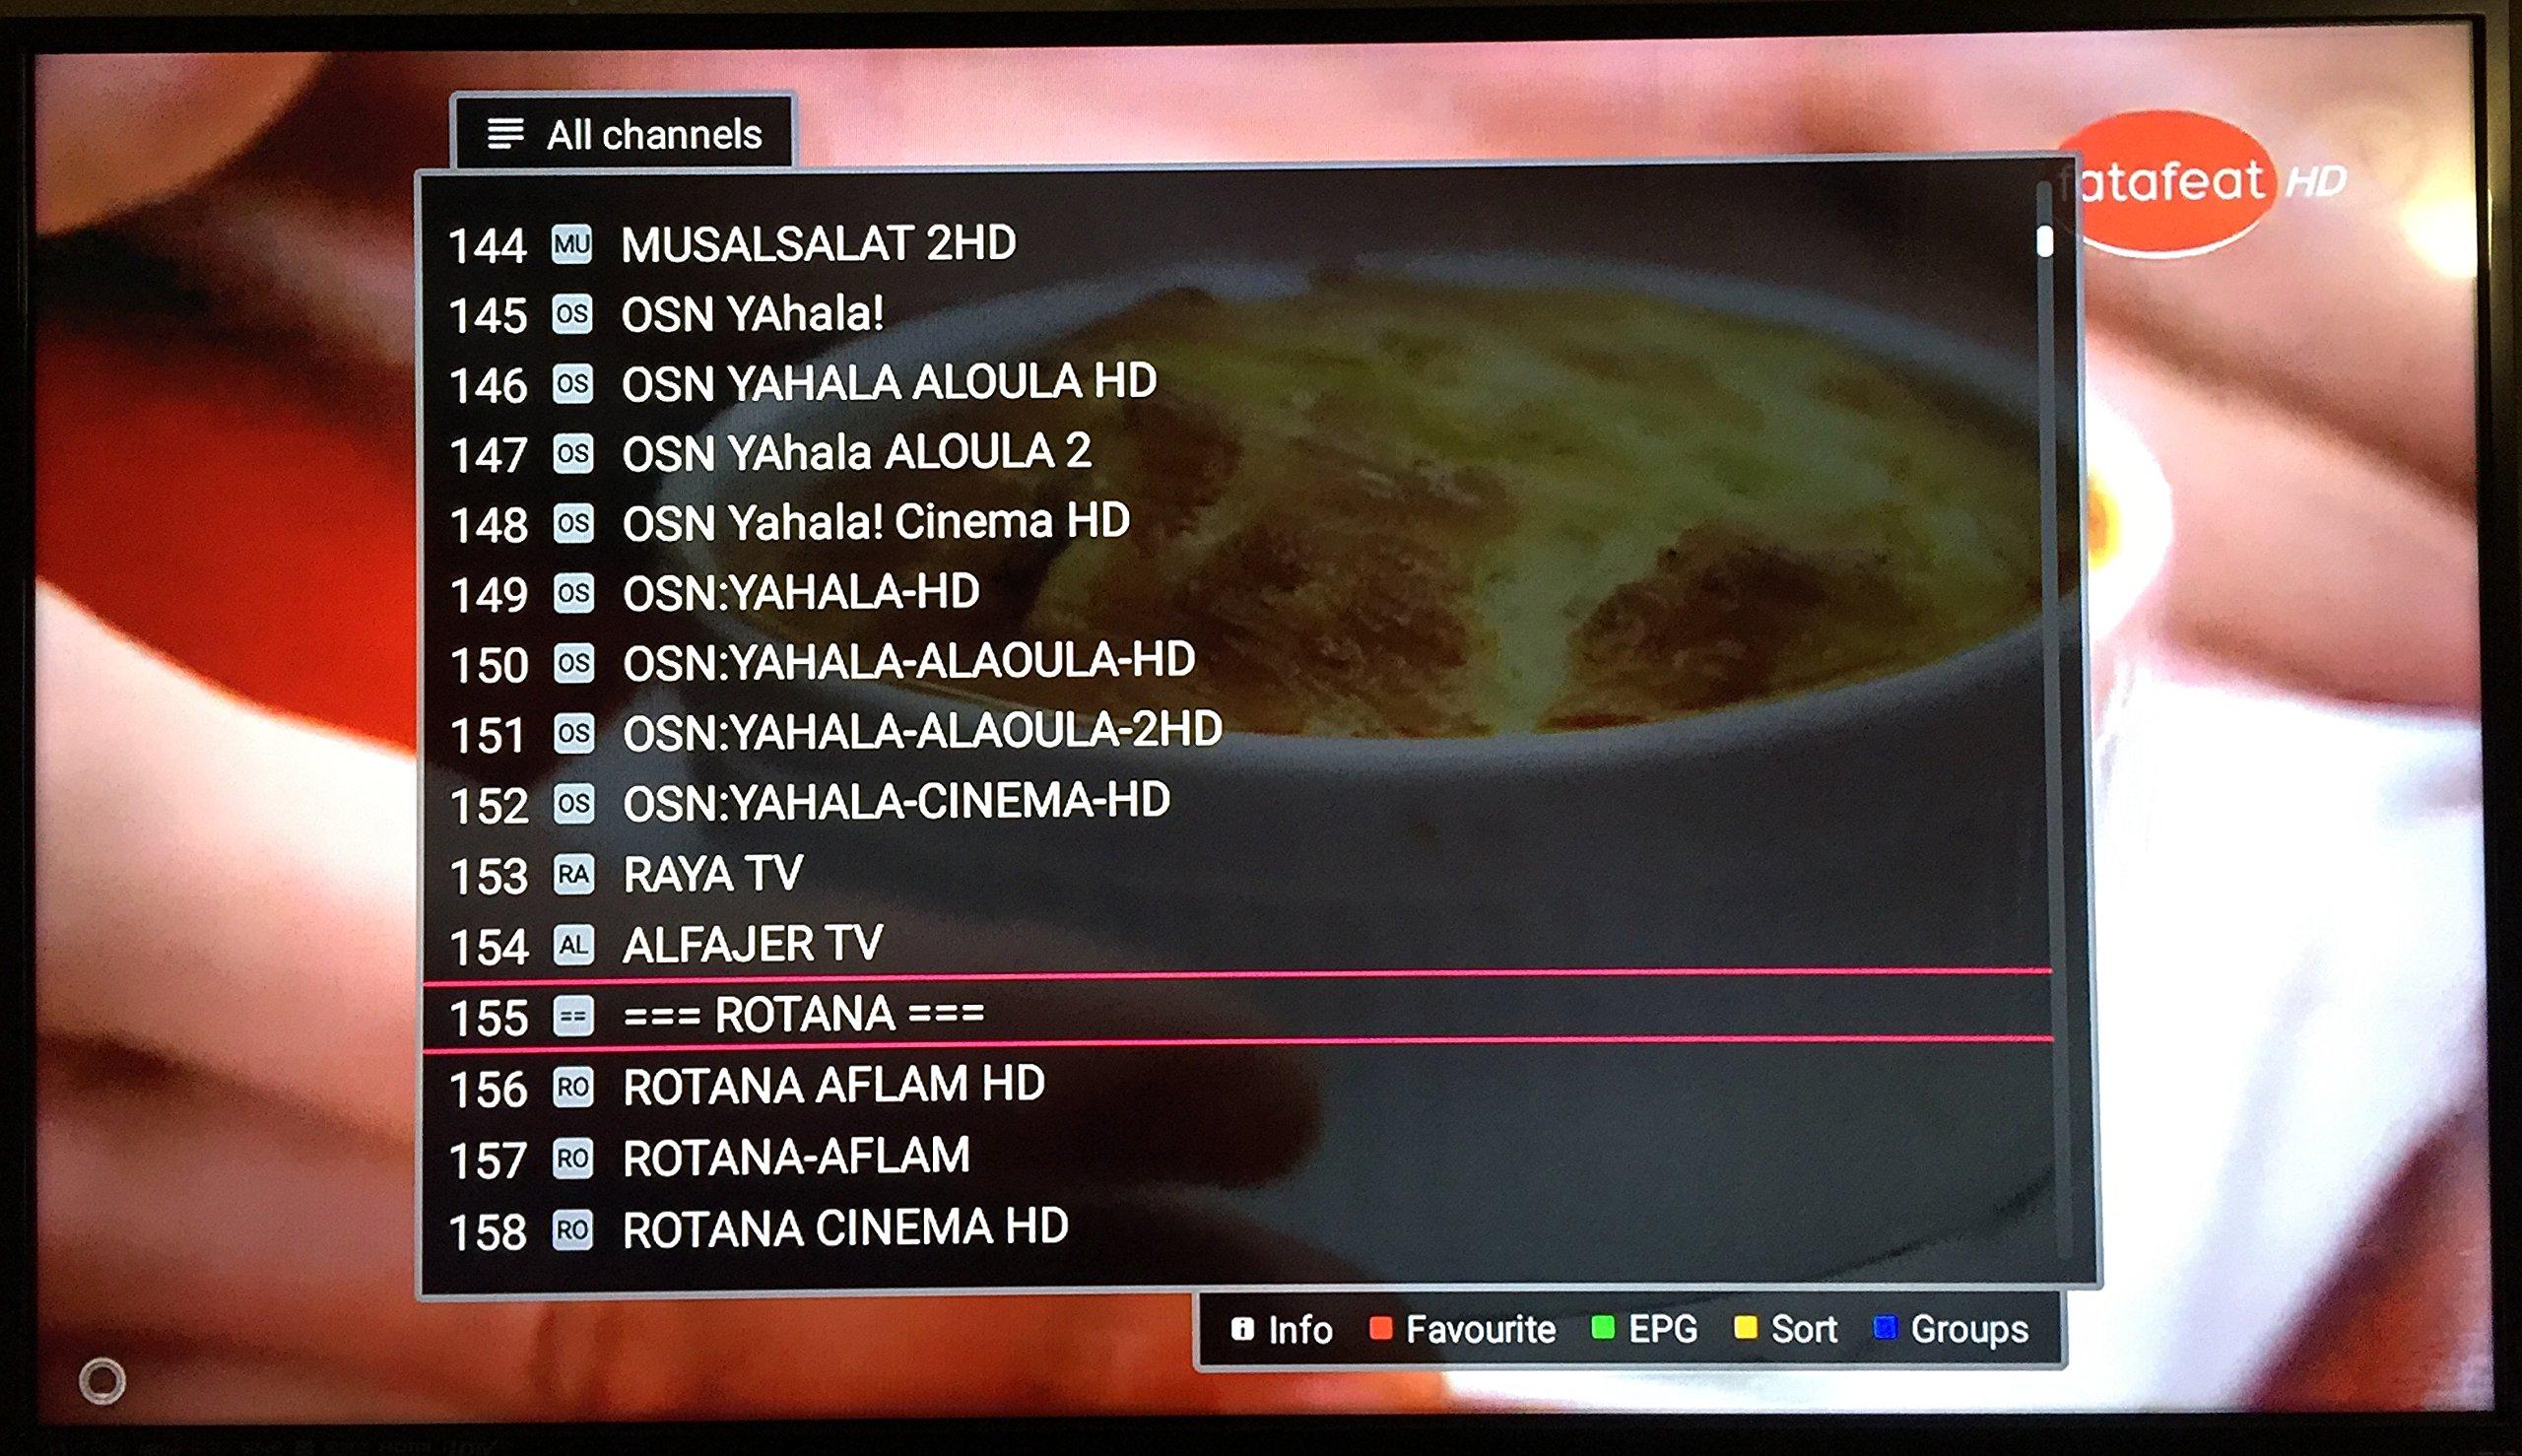 Arabia TV Super HD Receiver with 3000 Channel جهاز العائلة للقنواة العربية والعالمية (3000 Channel) by iptv+ (Image #2)